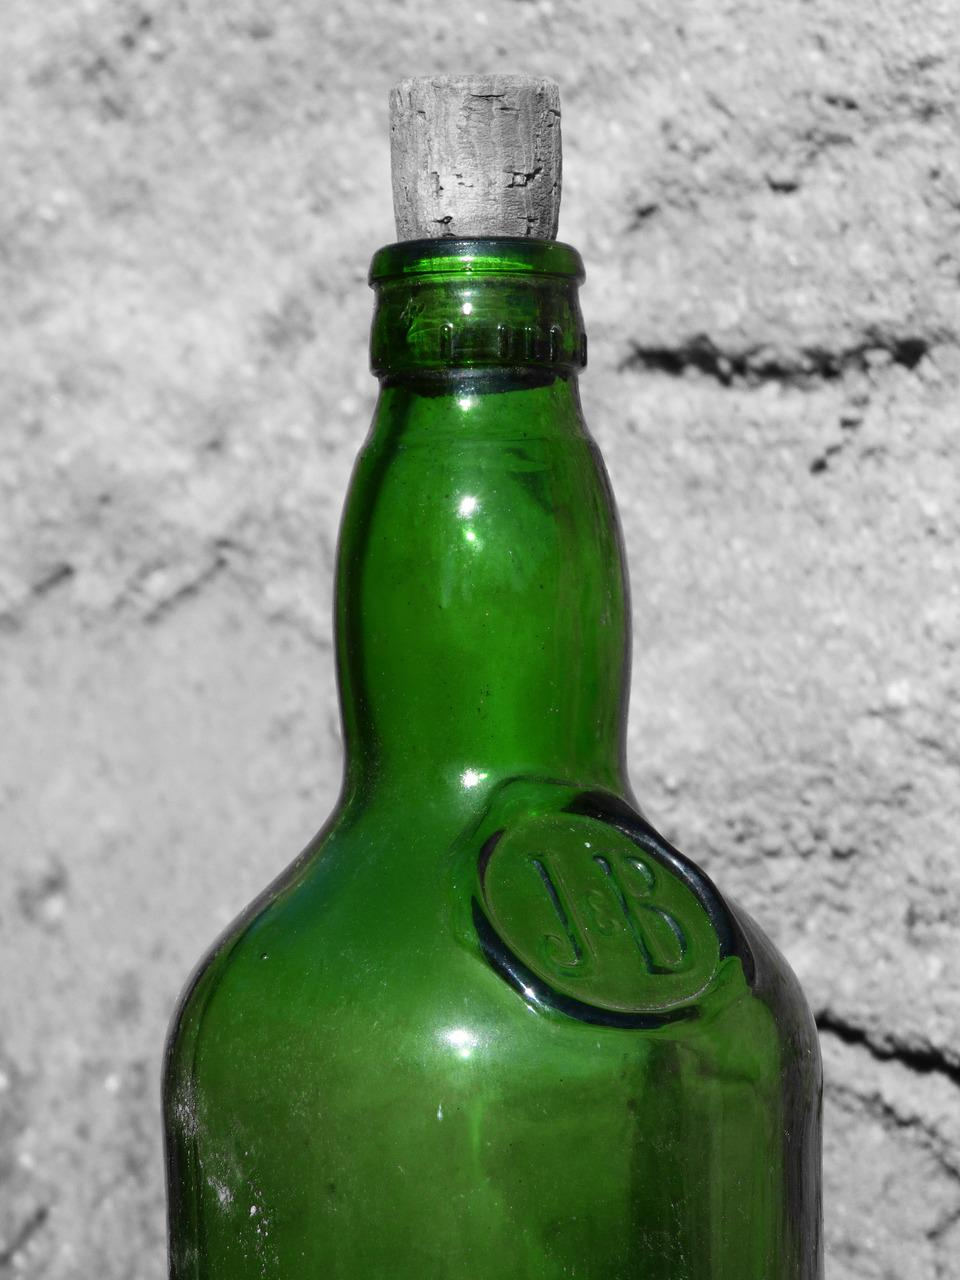 Collectible Bottles & Antique Bottles - Antique Bottle Depot Old green bottles photos